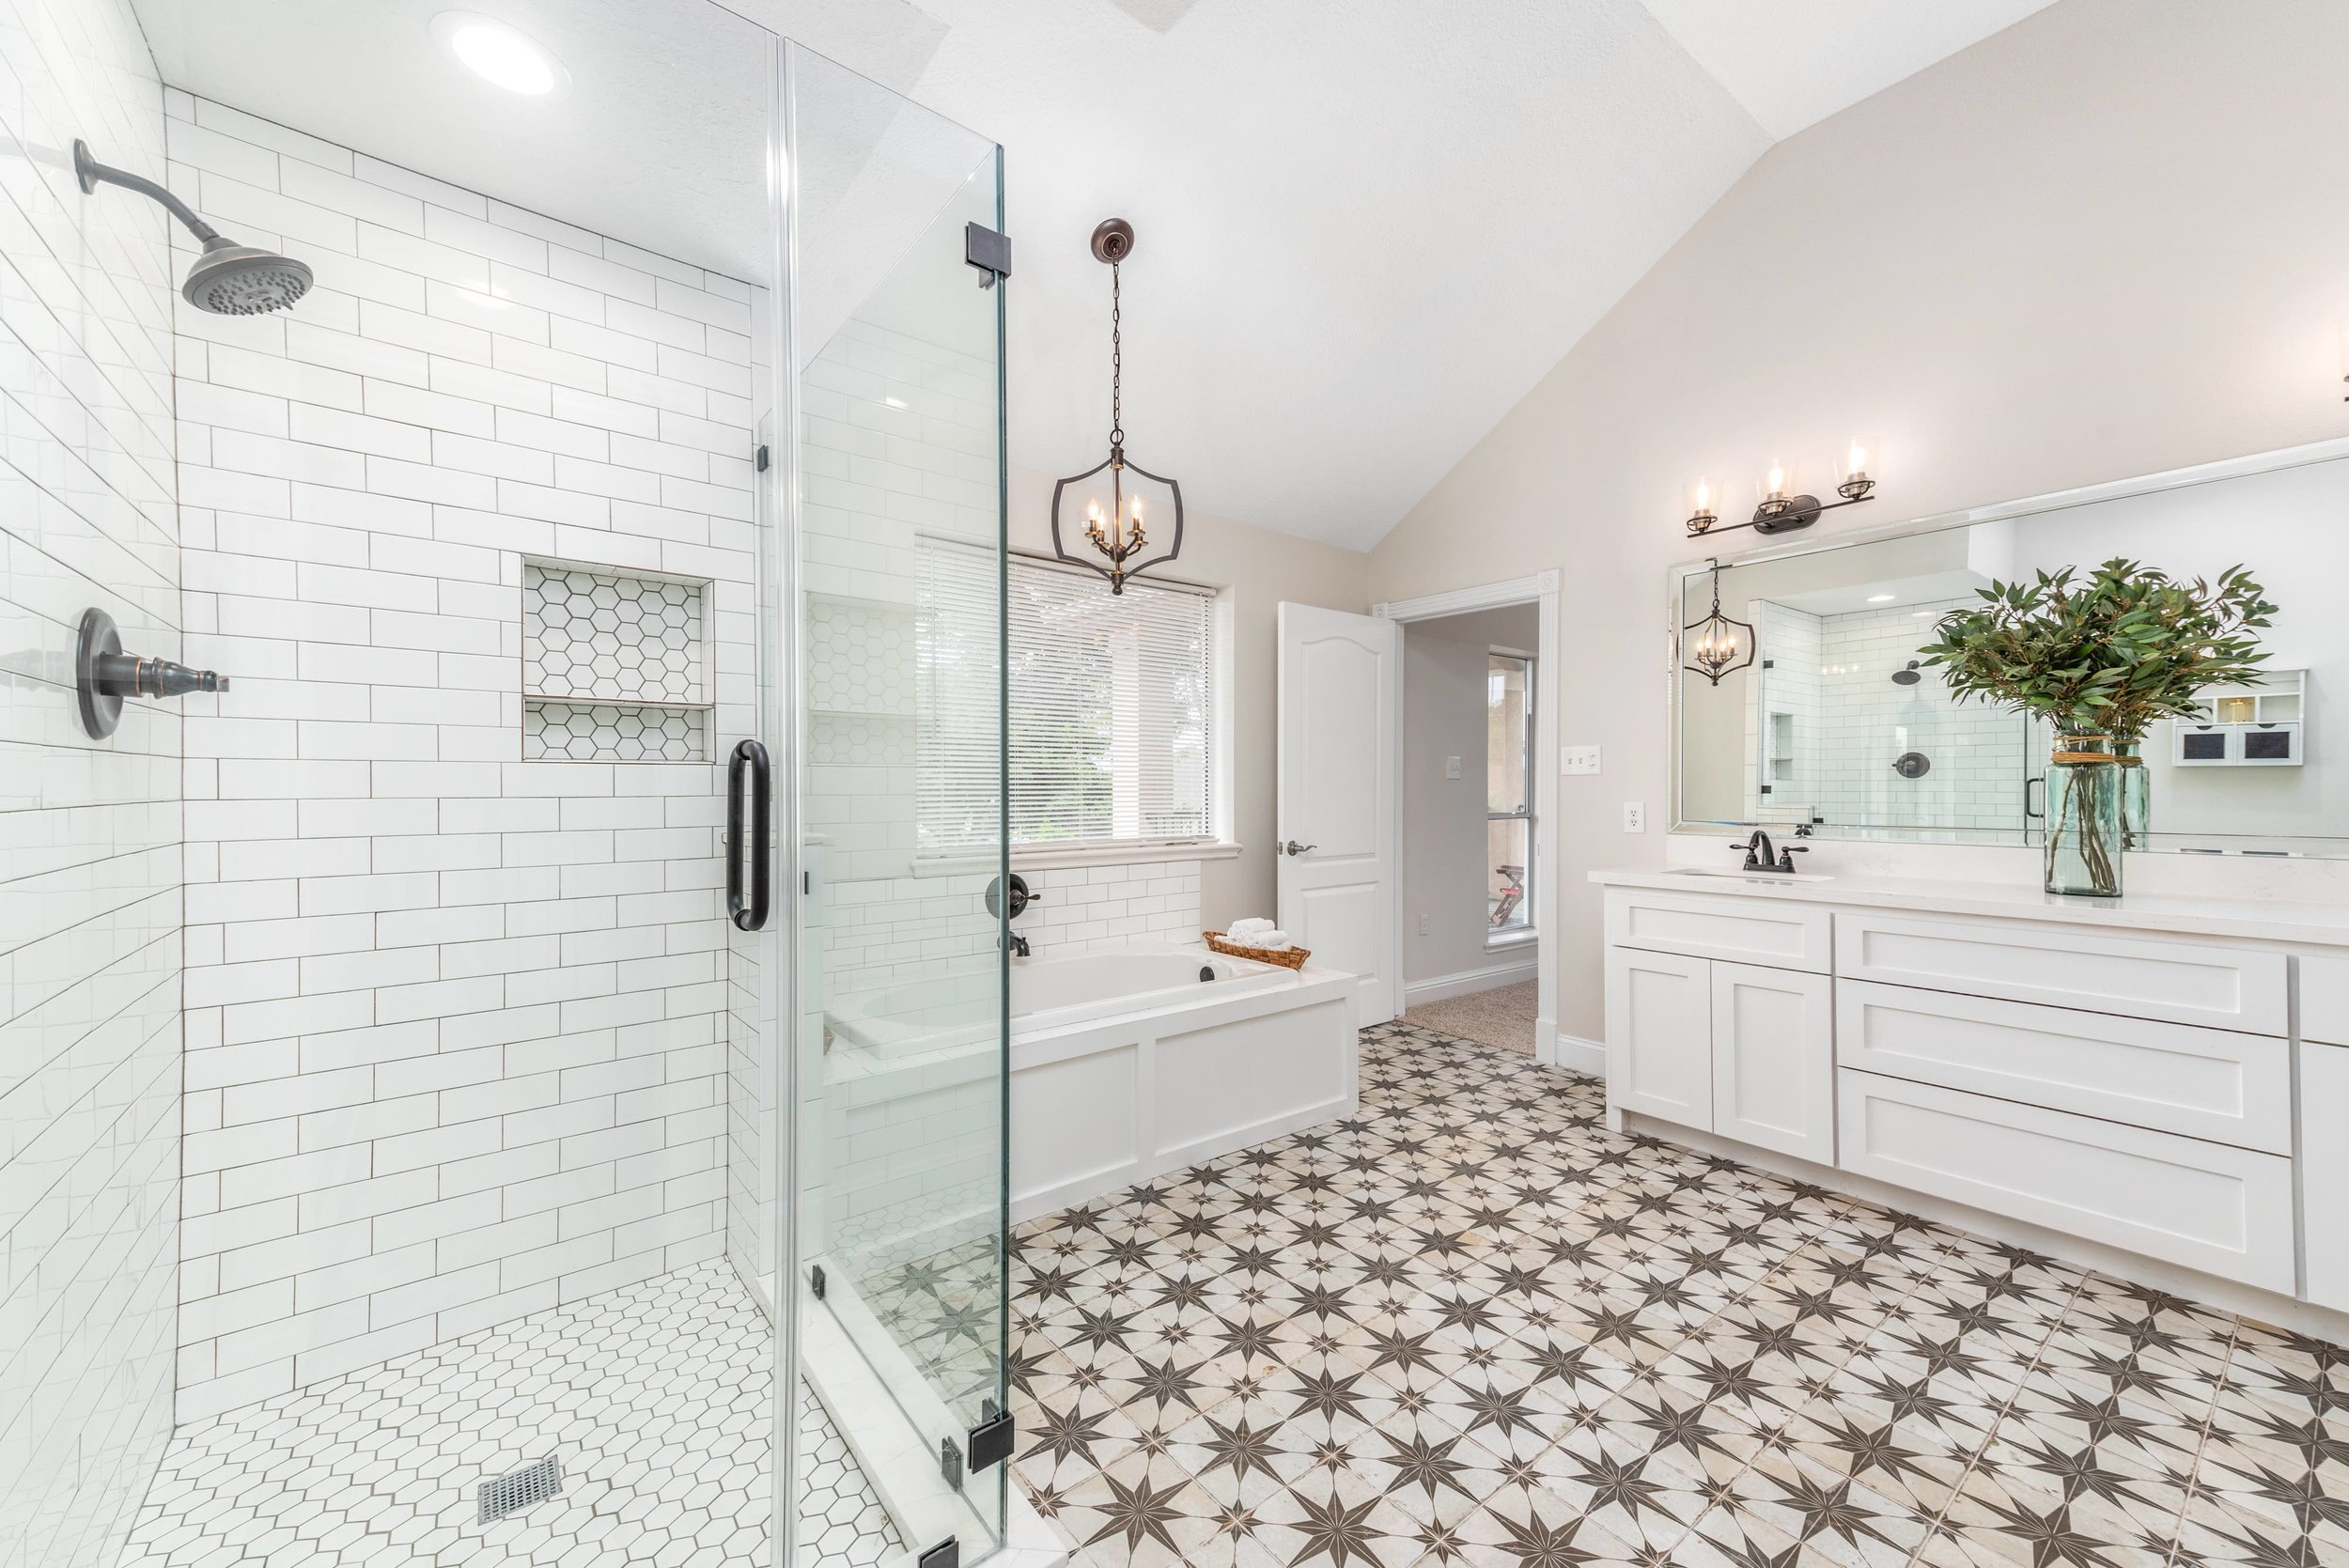 Master bathroom remodel. Frameless glass shower, subway tile, shaker style cabinets, white quarts countertops, oil rubbed bronze fixtures, eider white paint, ceramic tile.